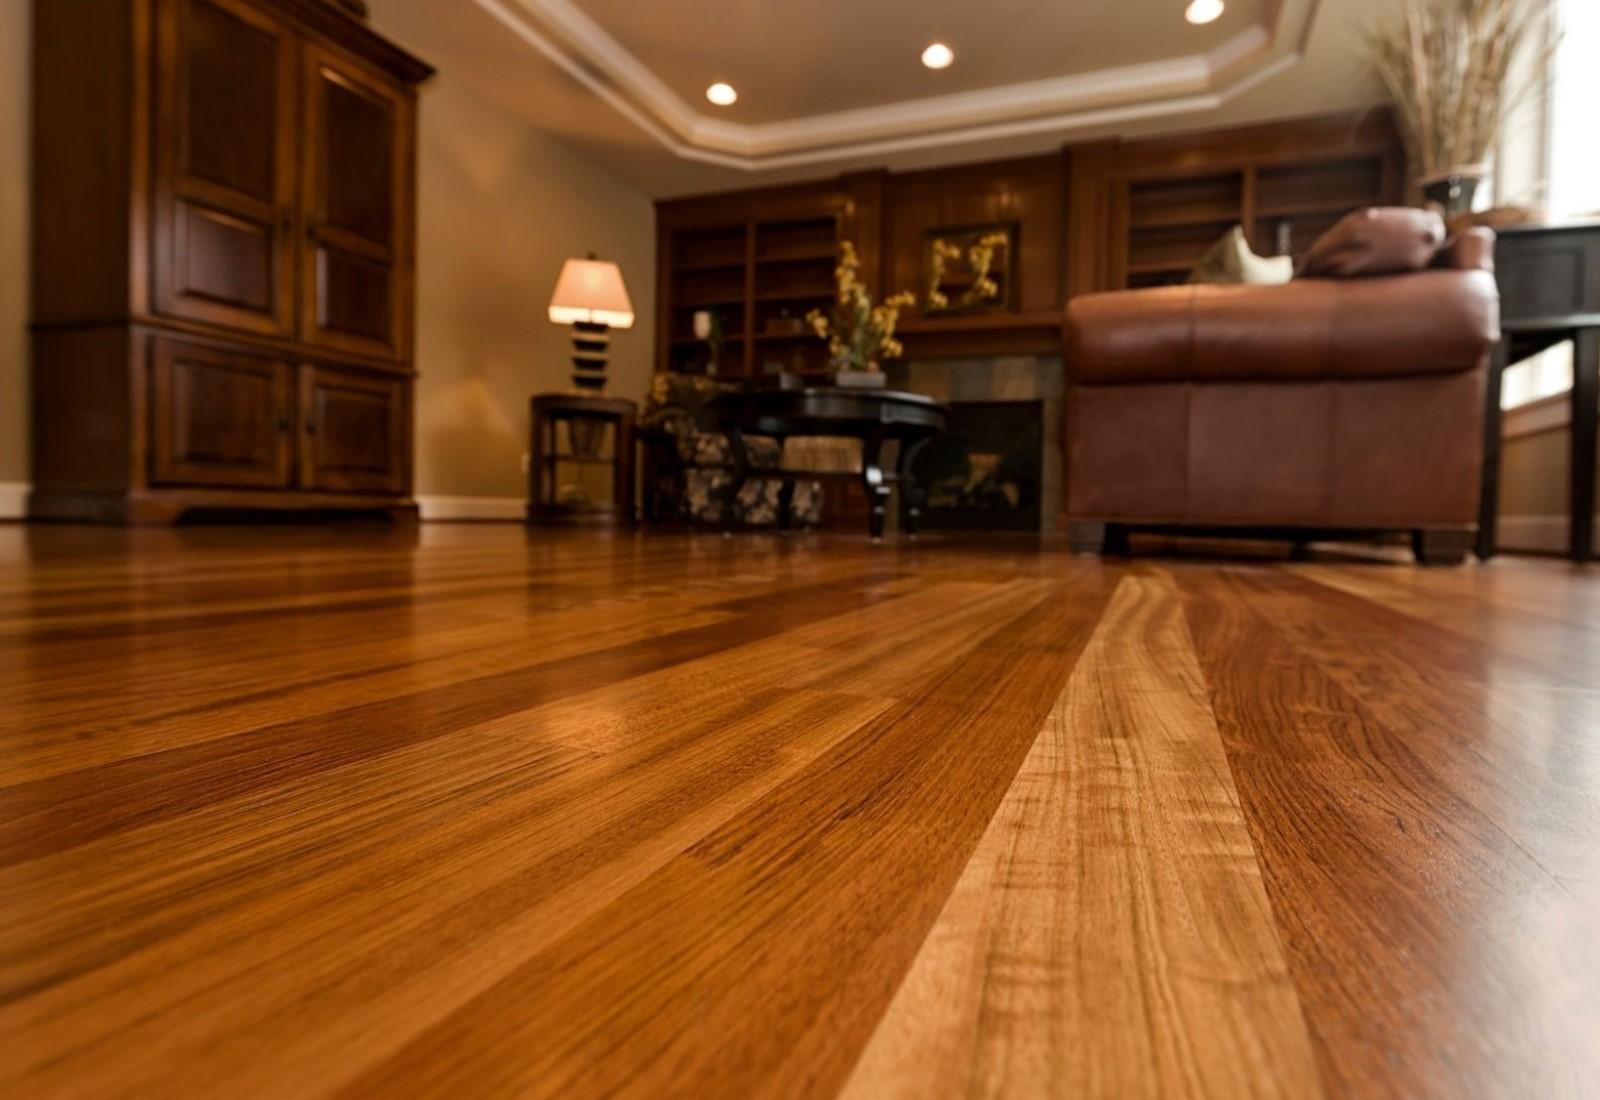 residential home floor wooden polishing sanding polished timber hardwood